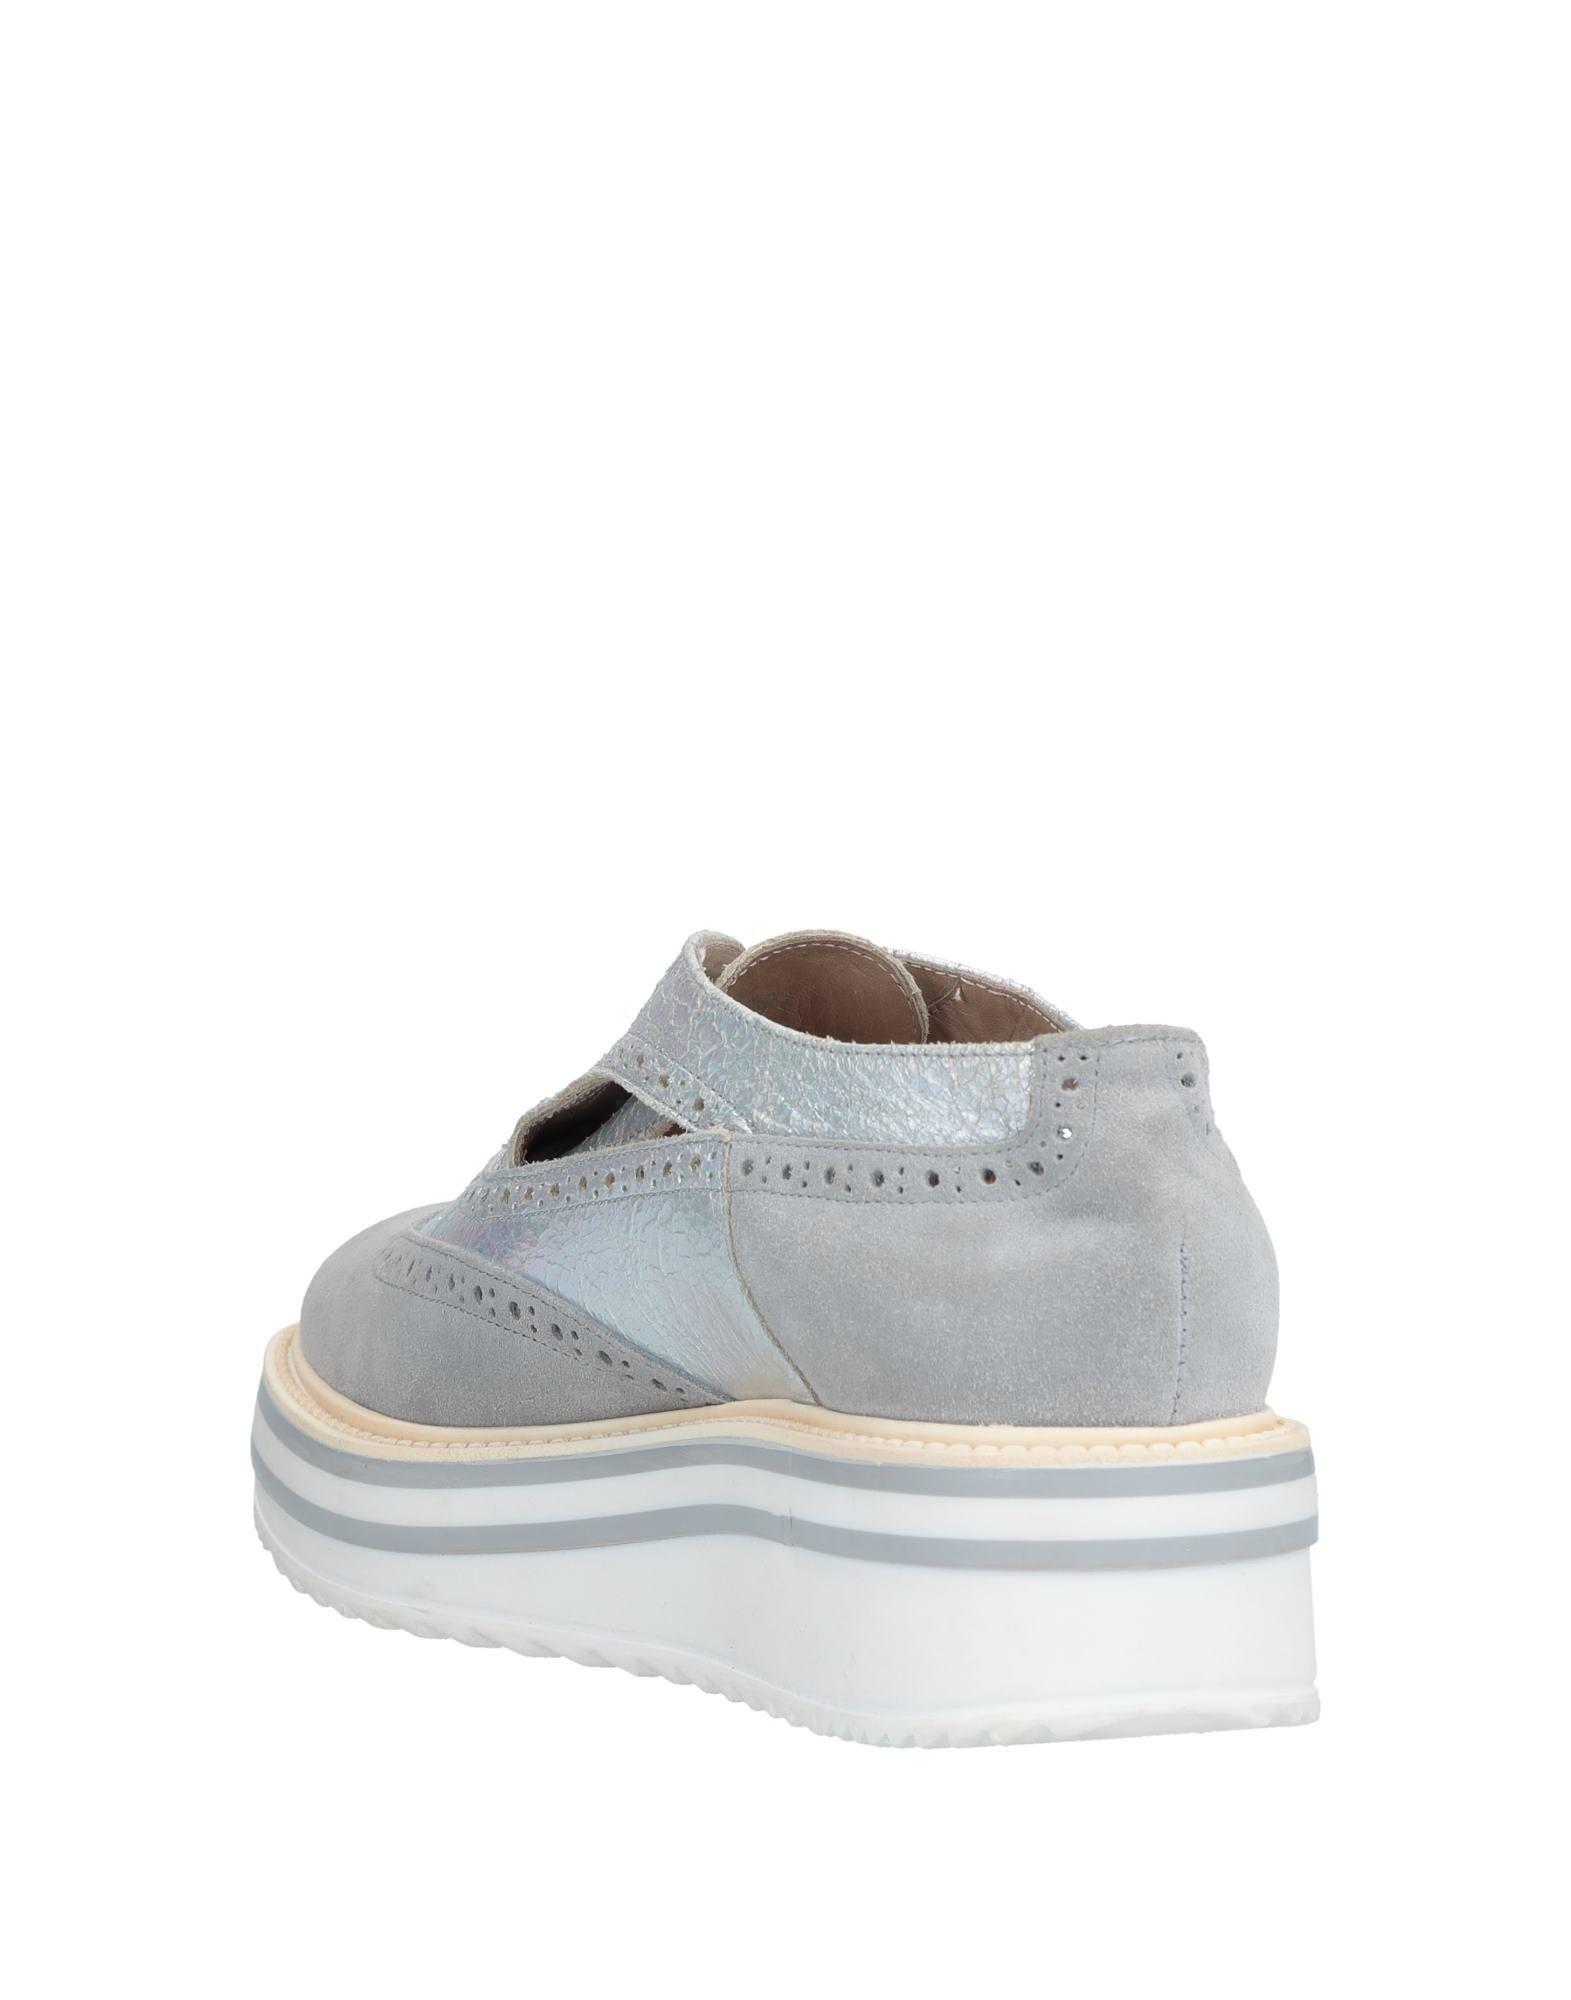 Sax Schnürschuhe Damen Damen Damen 11539239PM Gute Qualität beliebte Schuhe fc1dd2